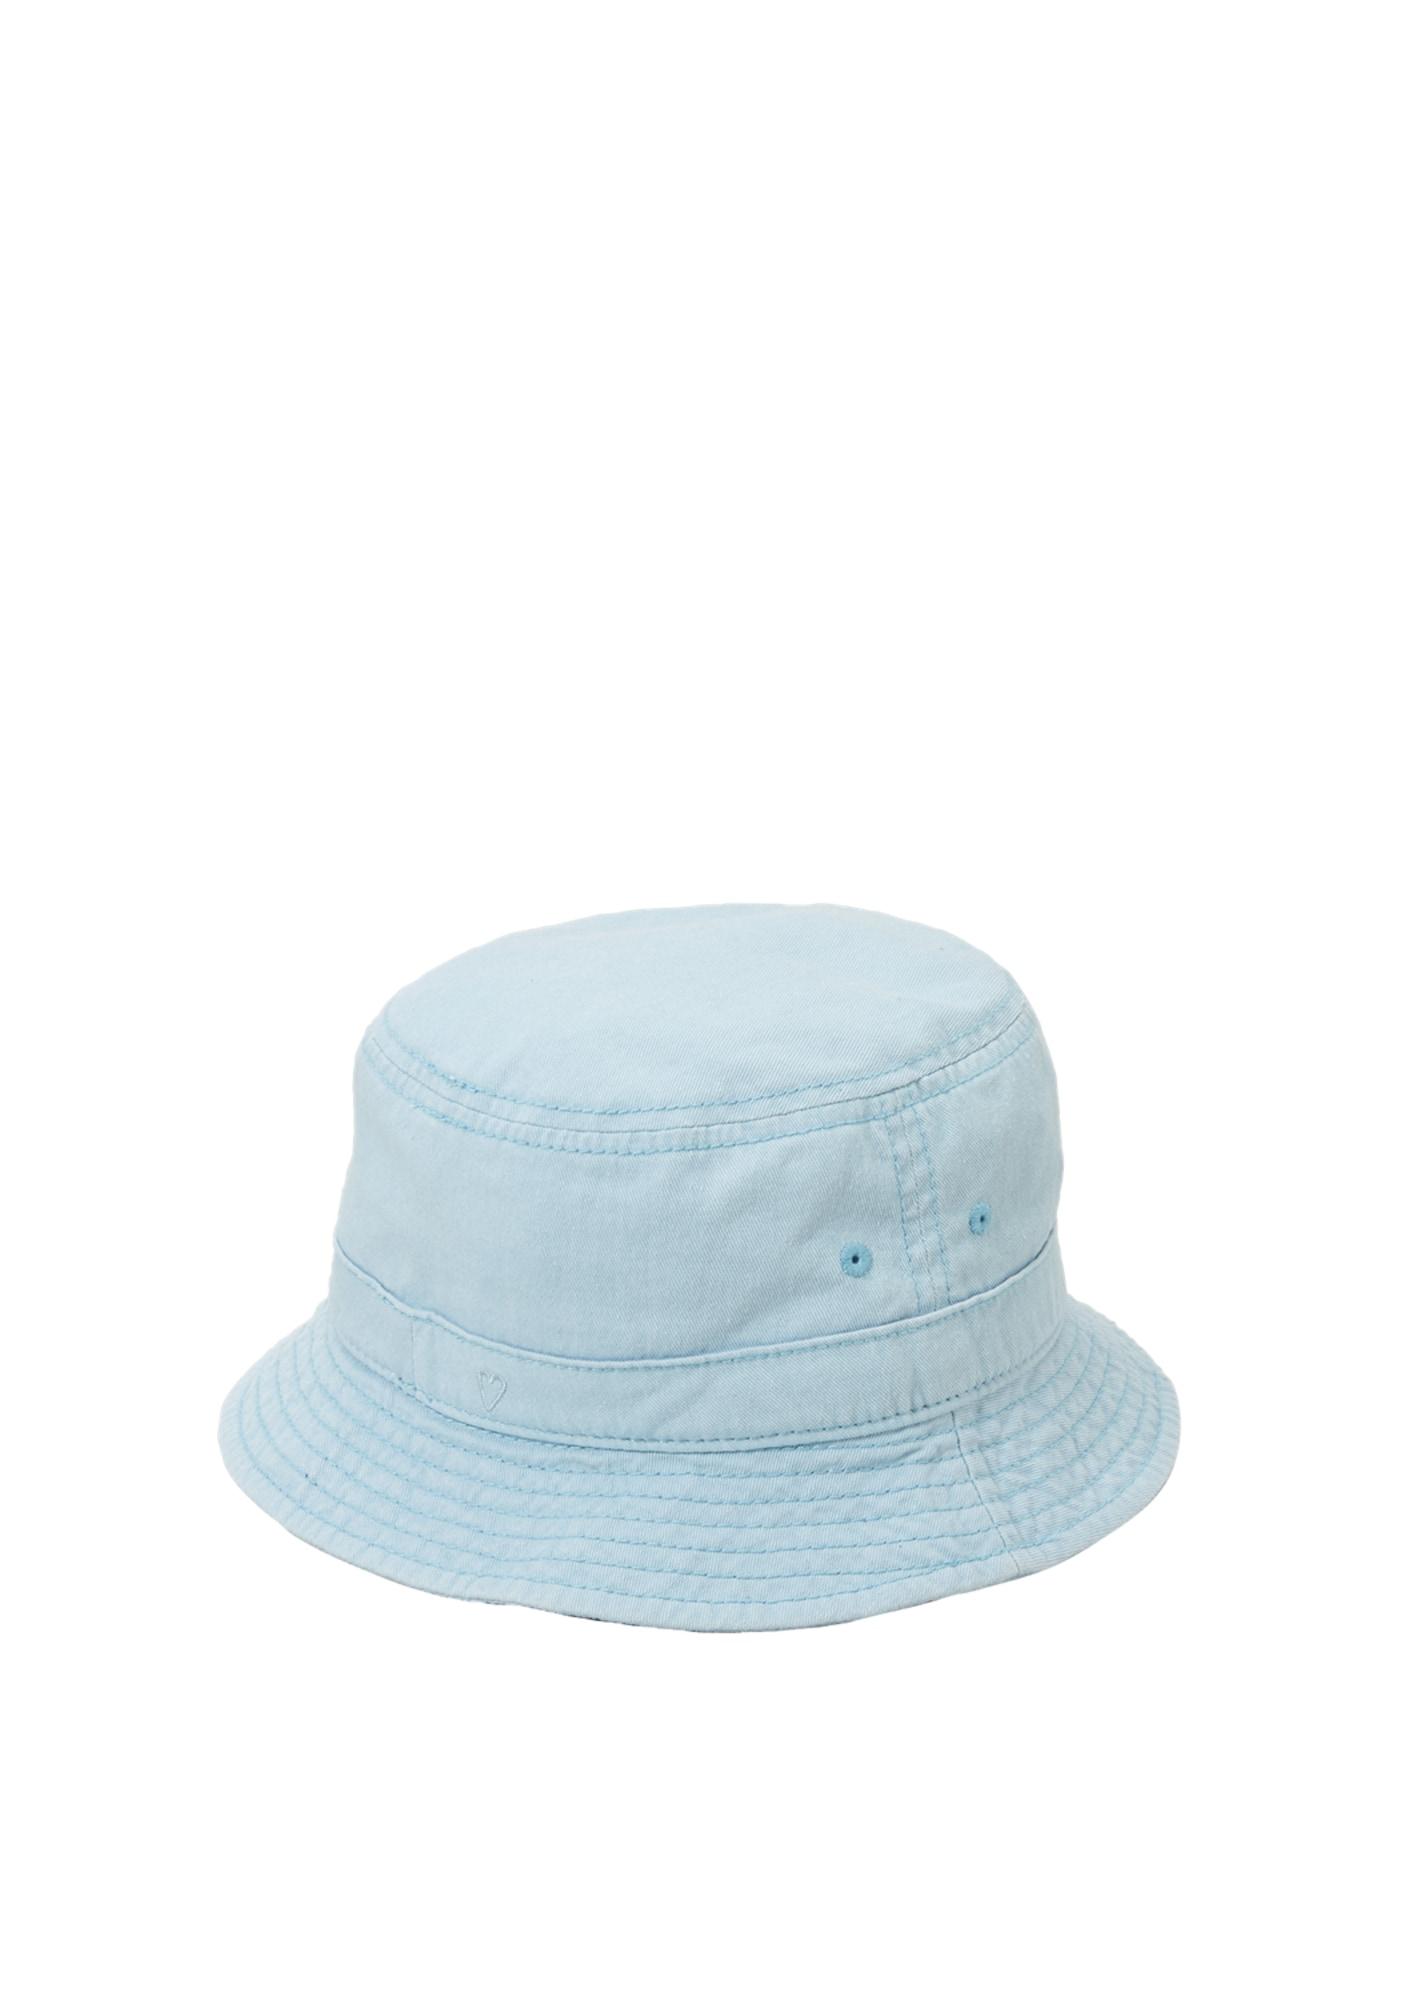 Sonnenhut   Accessoires > Hüte > Sonnenhüte   Hellblau   S.Oliver